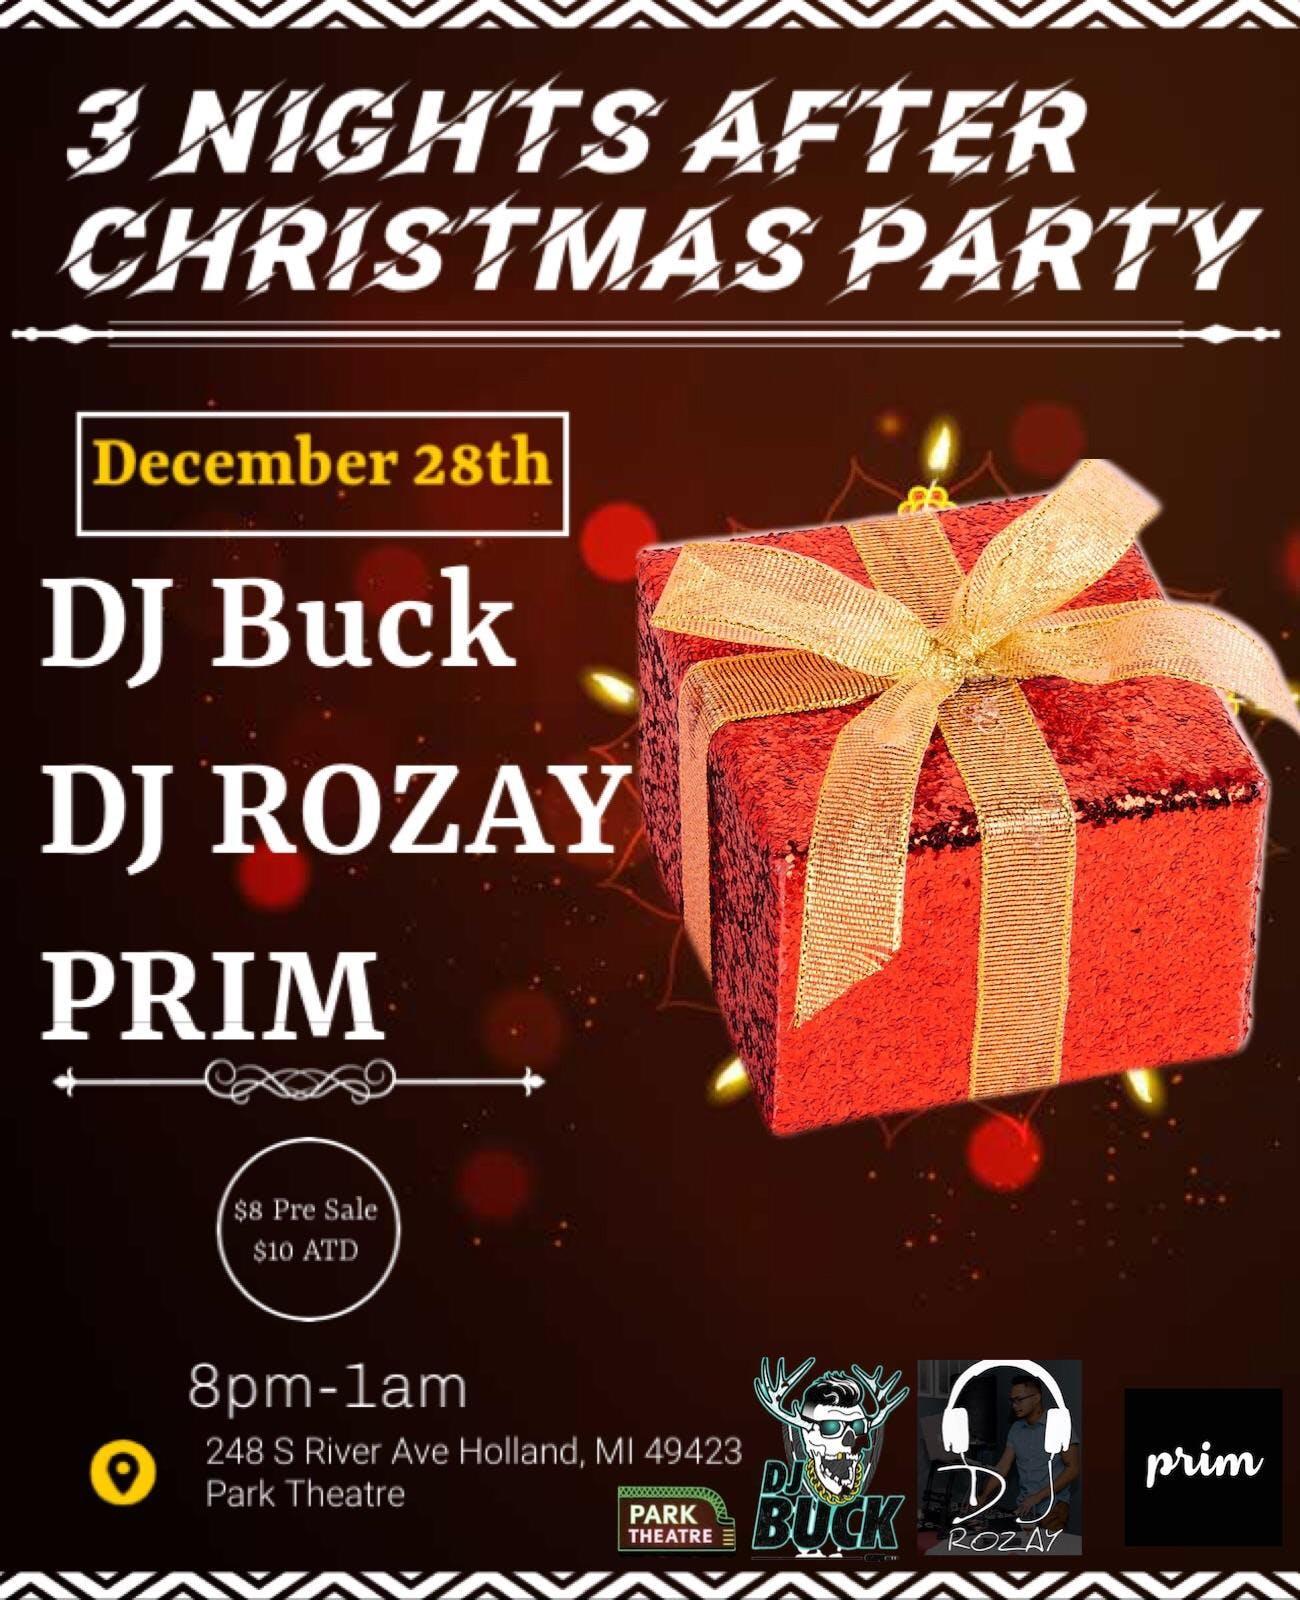 DJ Buck, DJ Rozay and PRIM